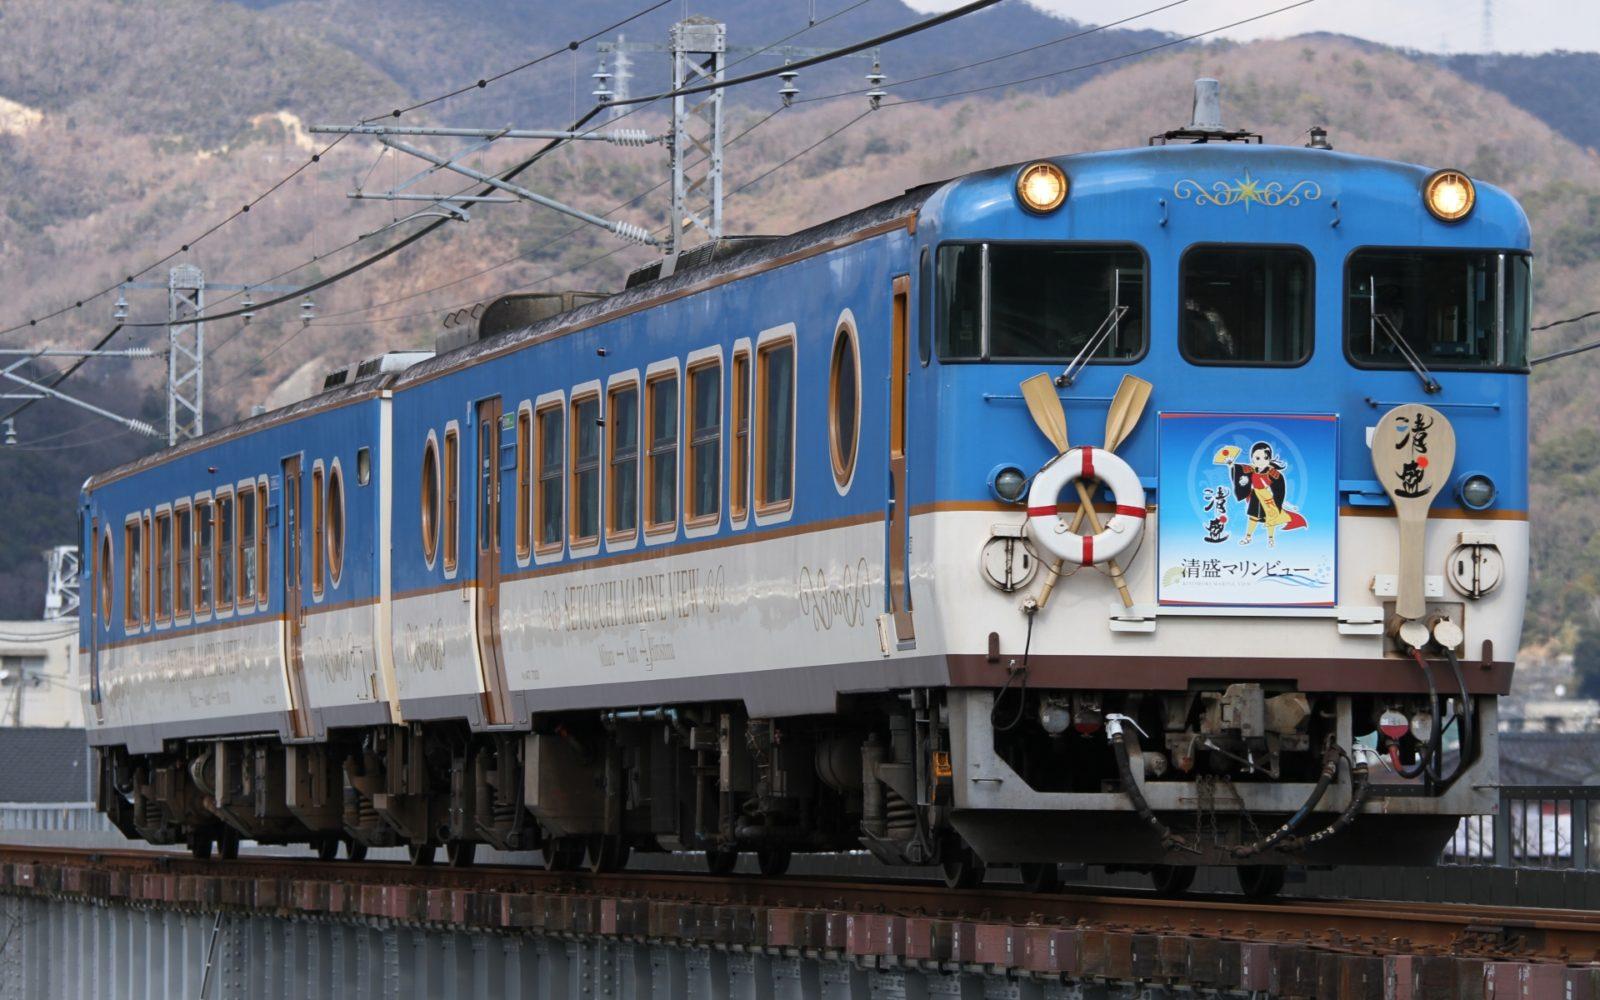 JR 2012年夏の臨時列車まとめ。JRパスで乗りたい列車を独断でピックアップ!